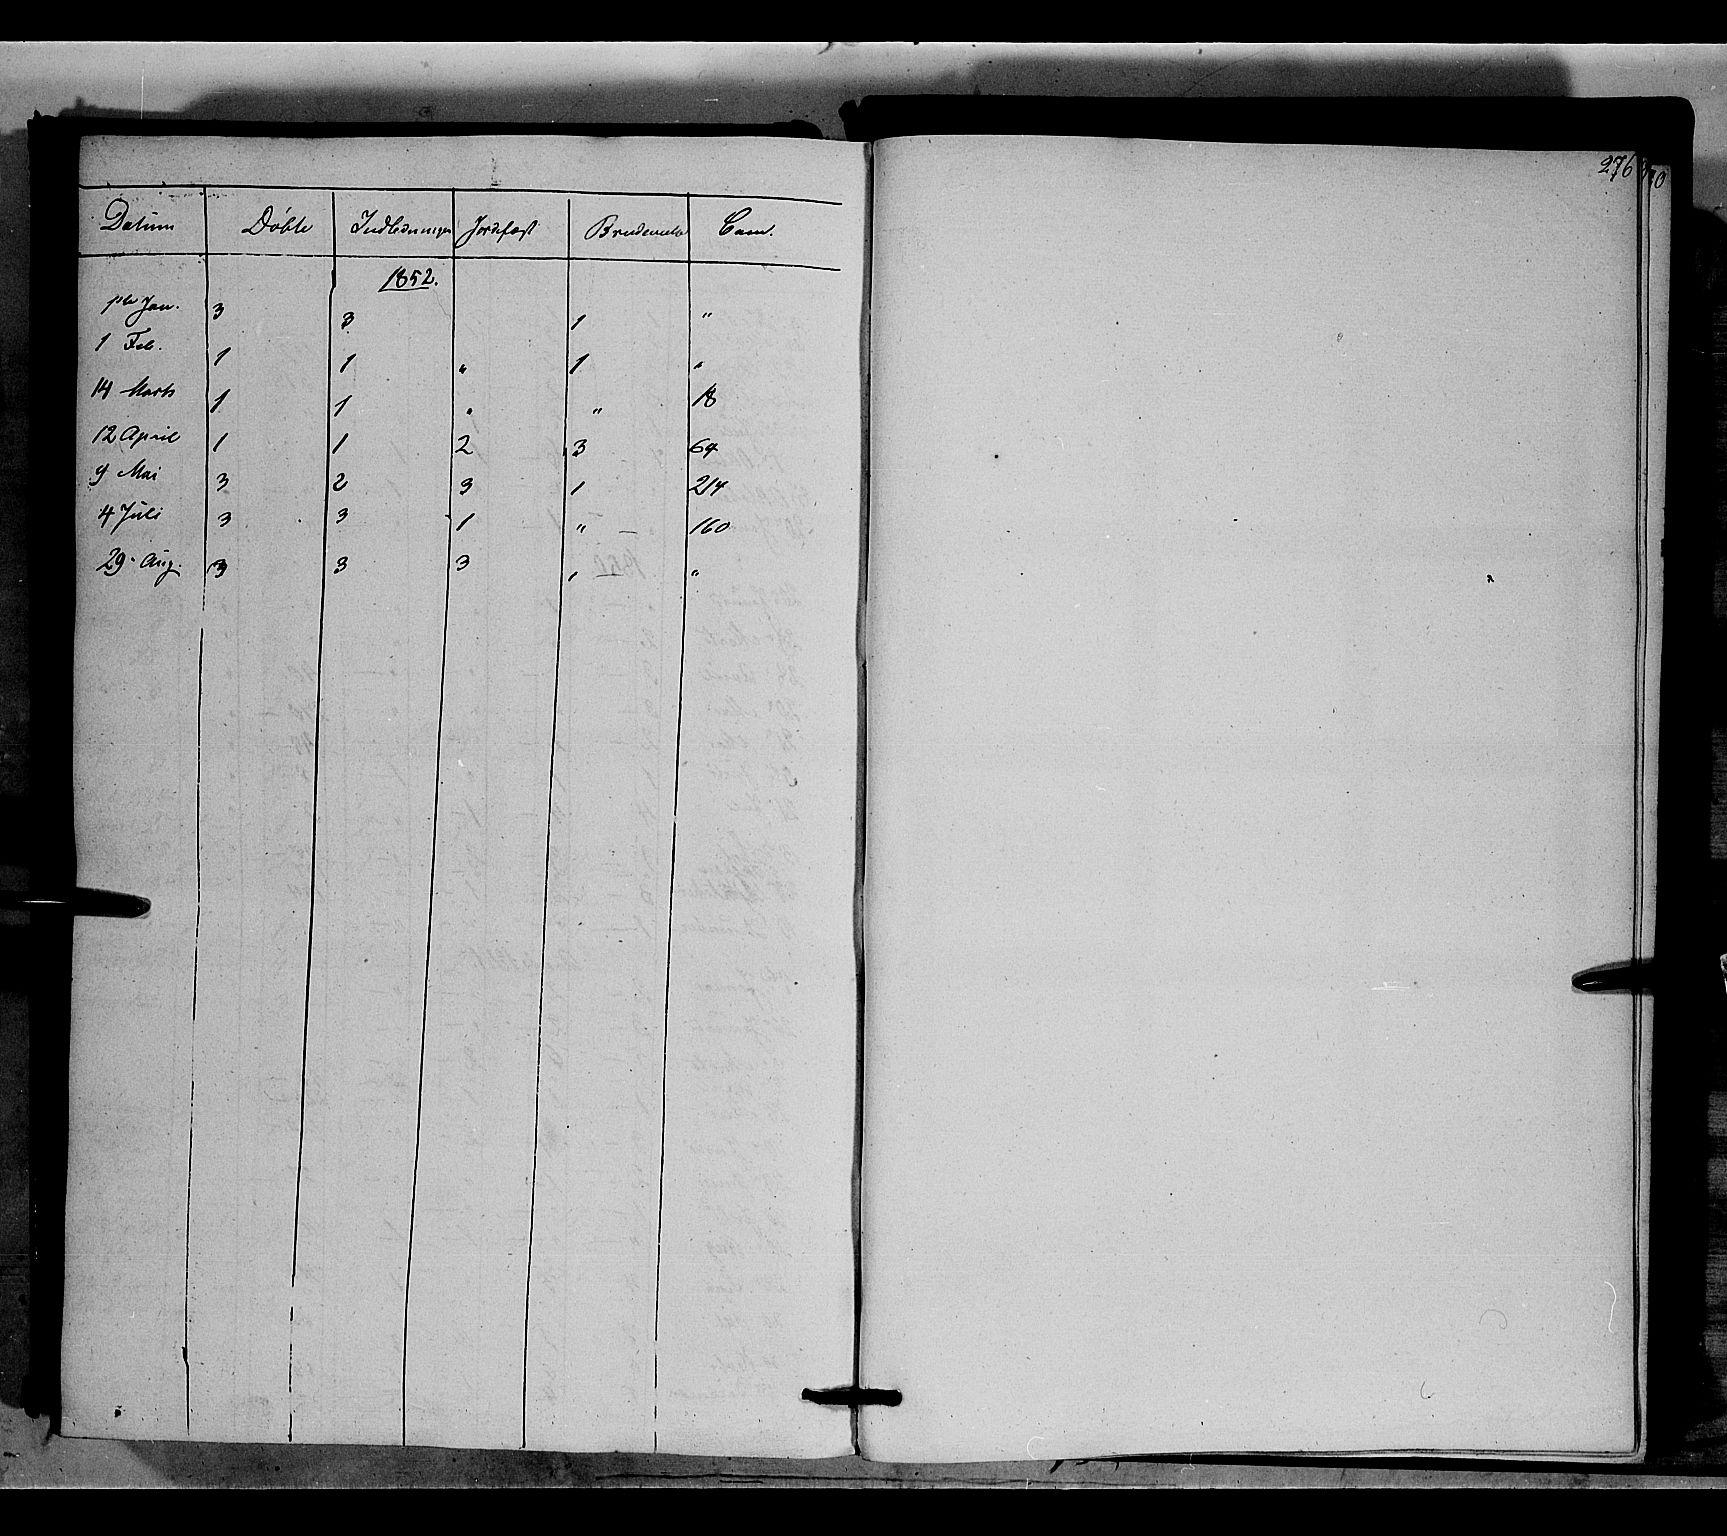 SAH, Nord-Aurdal prestekontor, Ministerialbok nr. 6, 1842-1863, s. 276